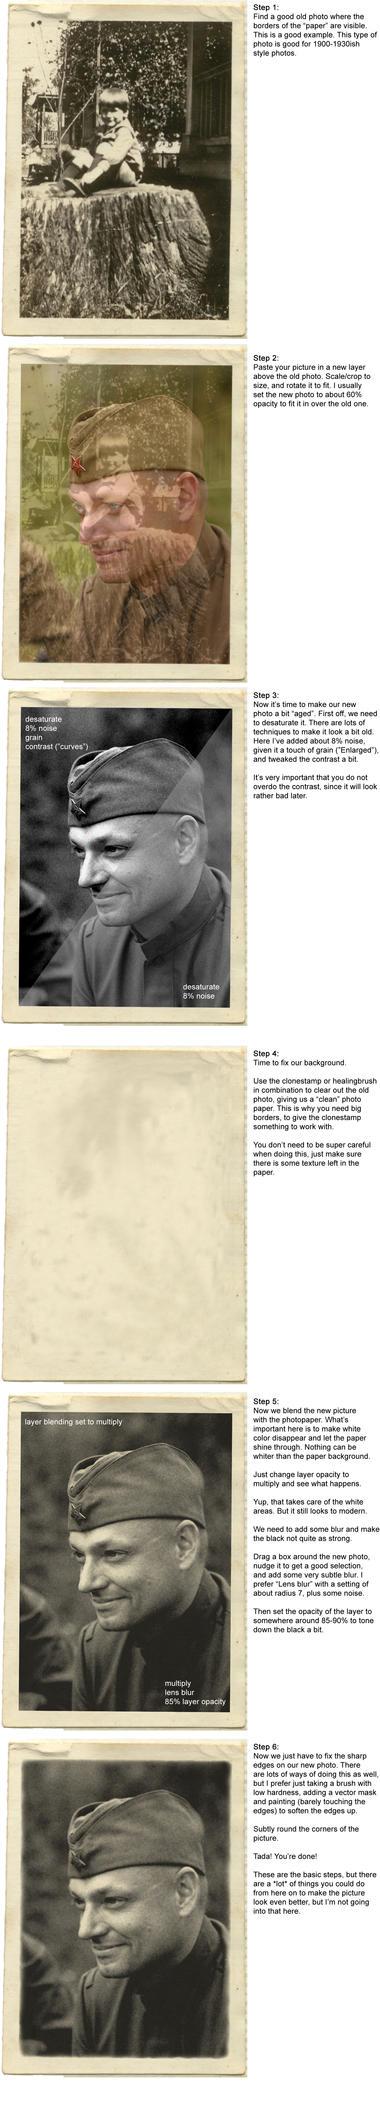 Vintage photos tutorial by nahkampf